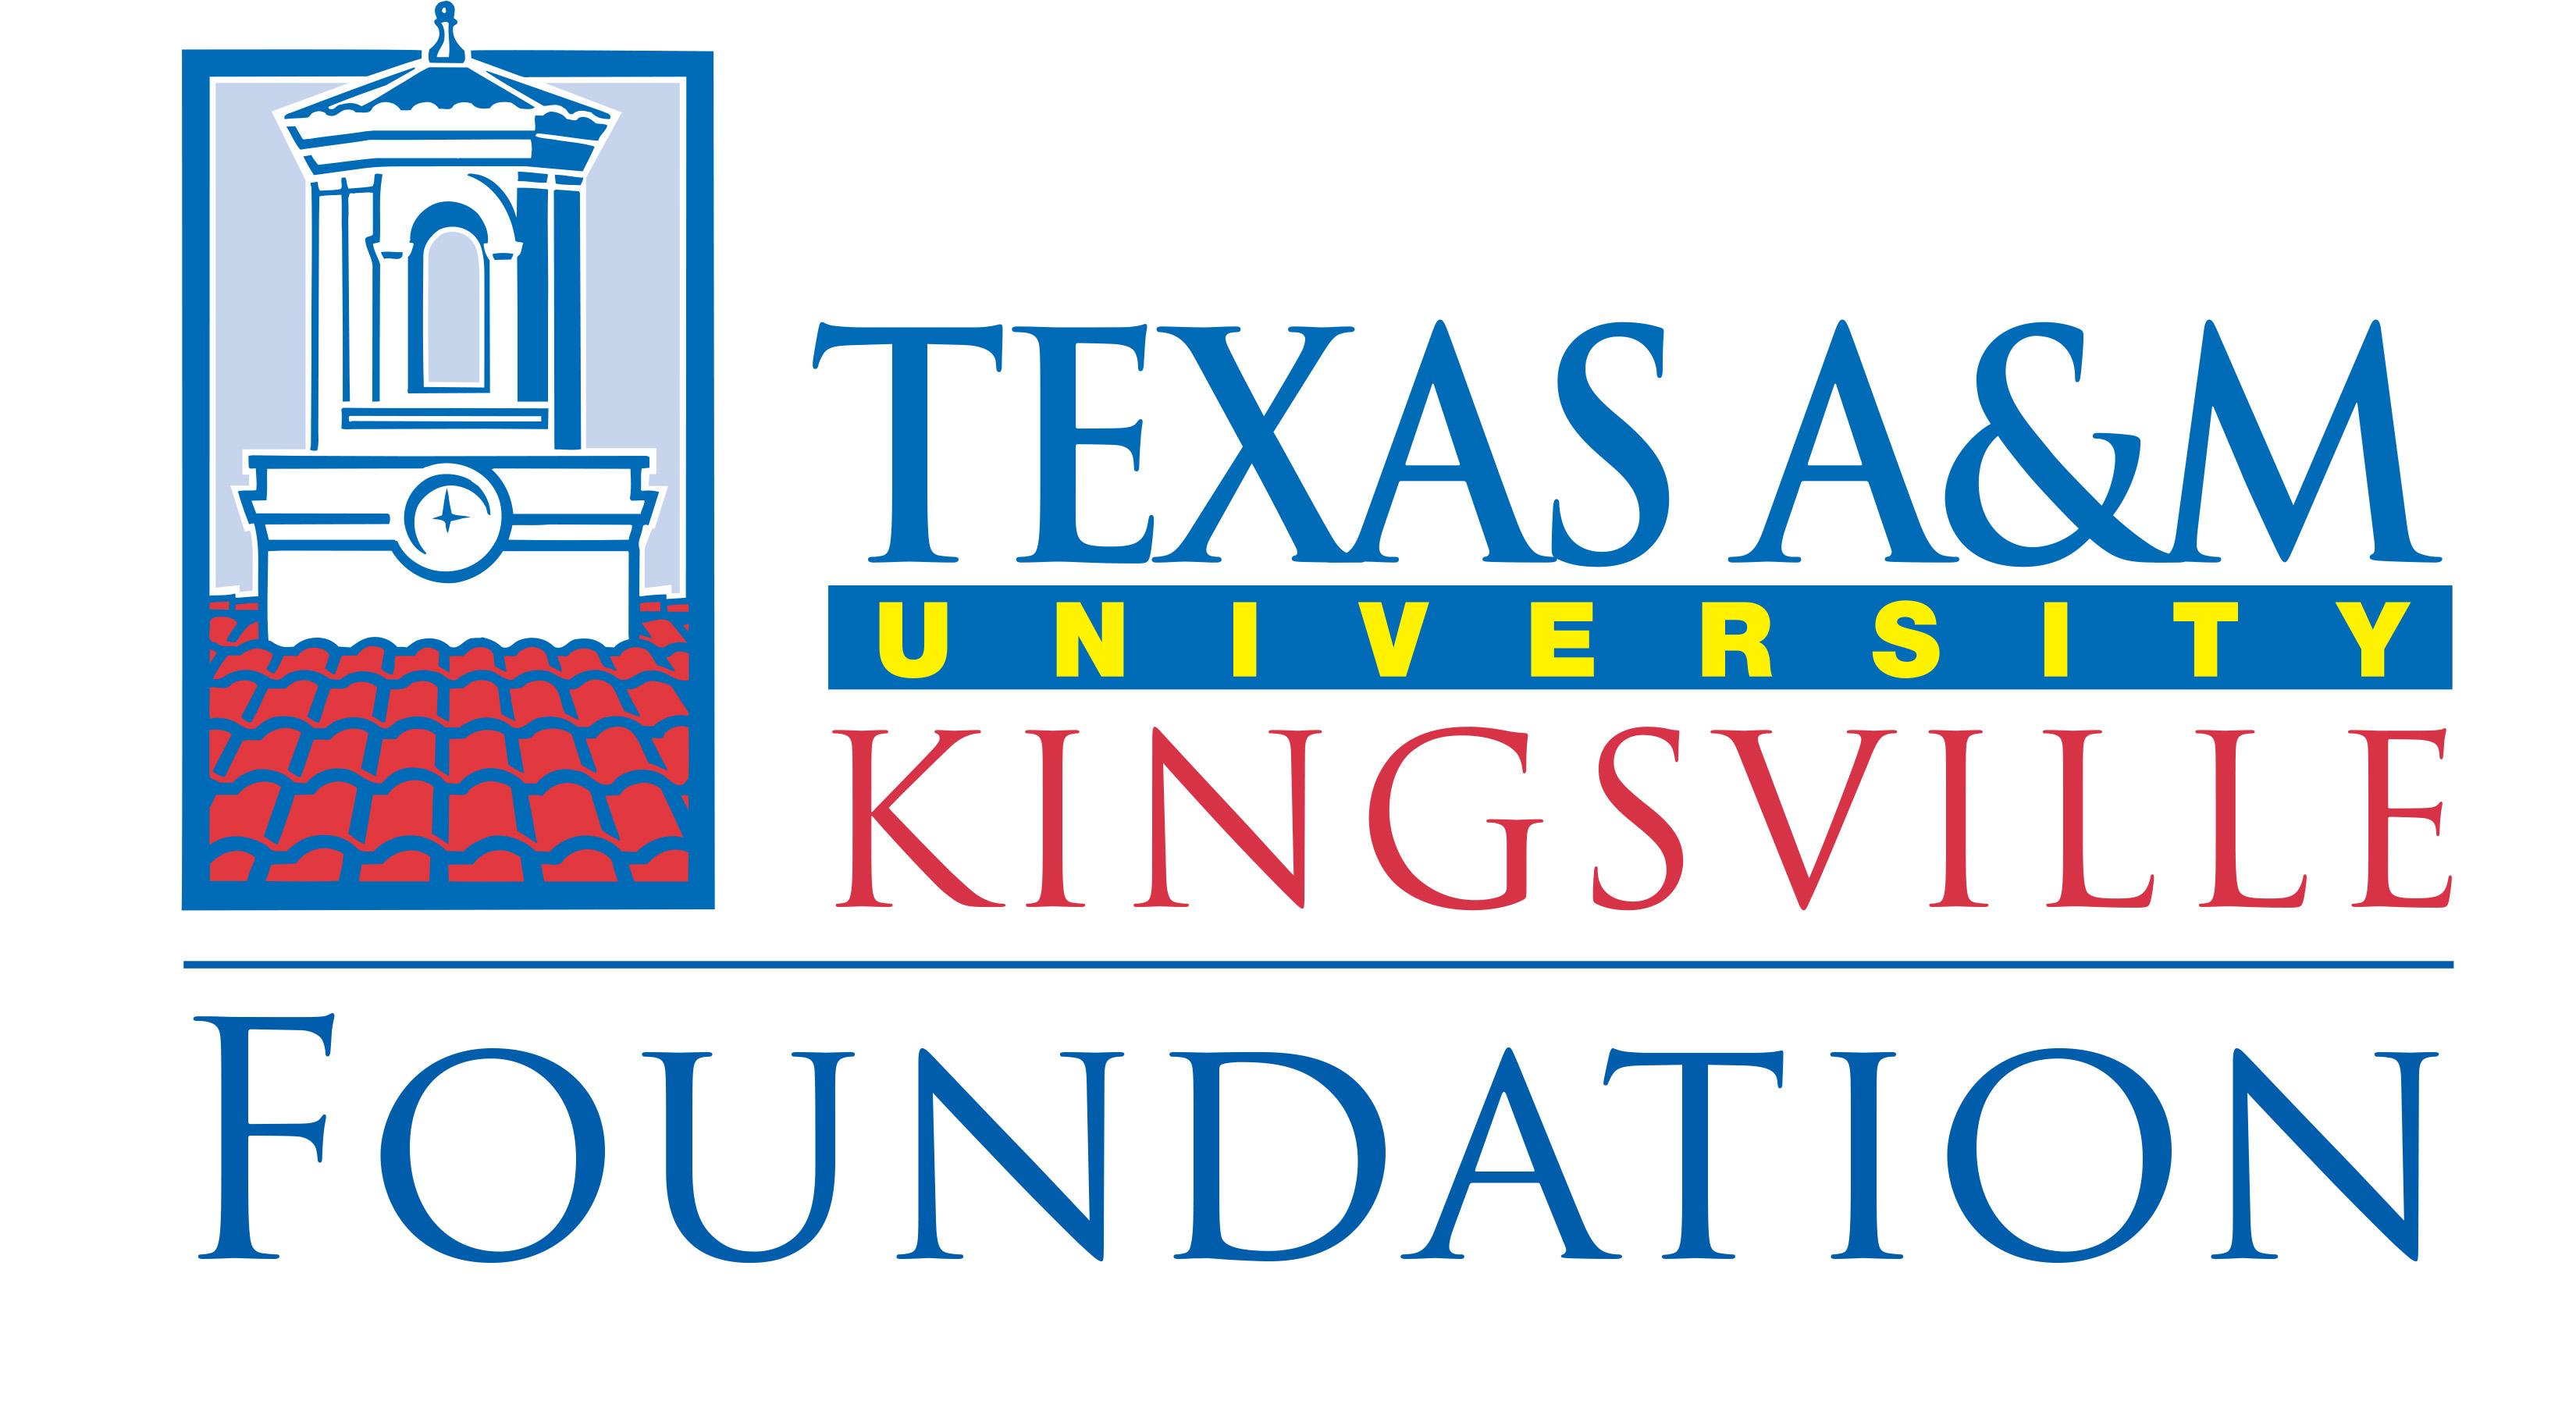 Texas A&M University-Kingsville Foundation